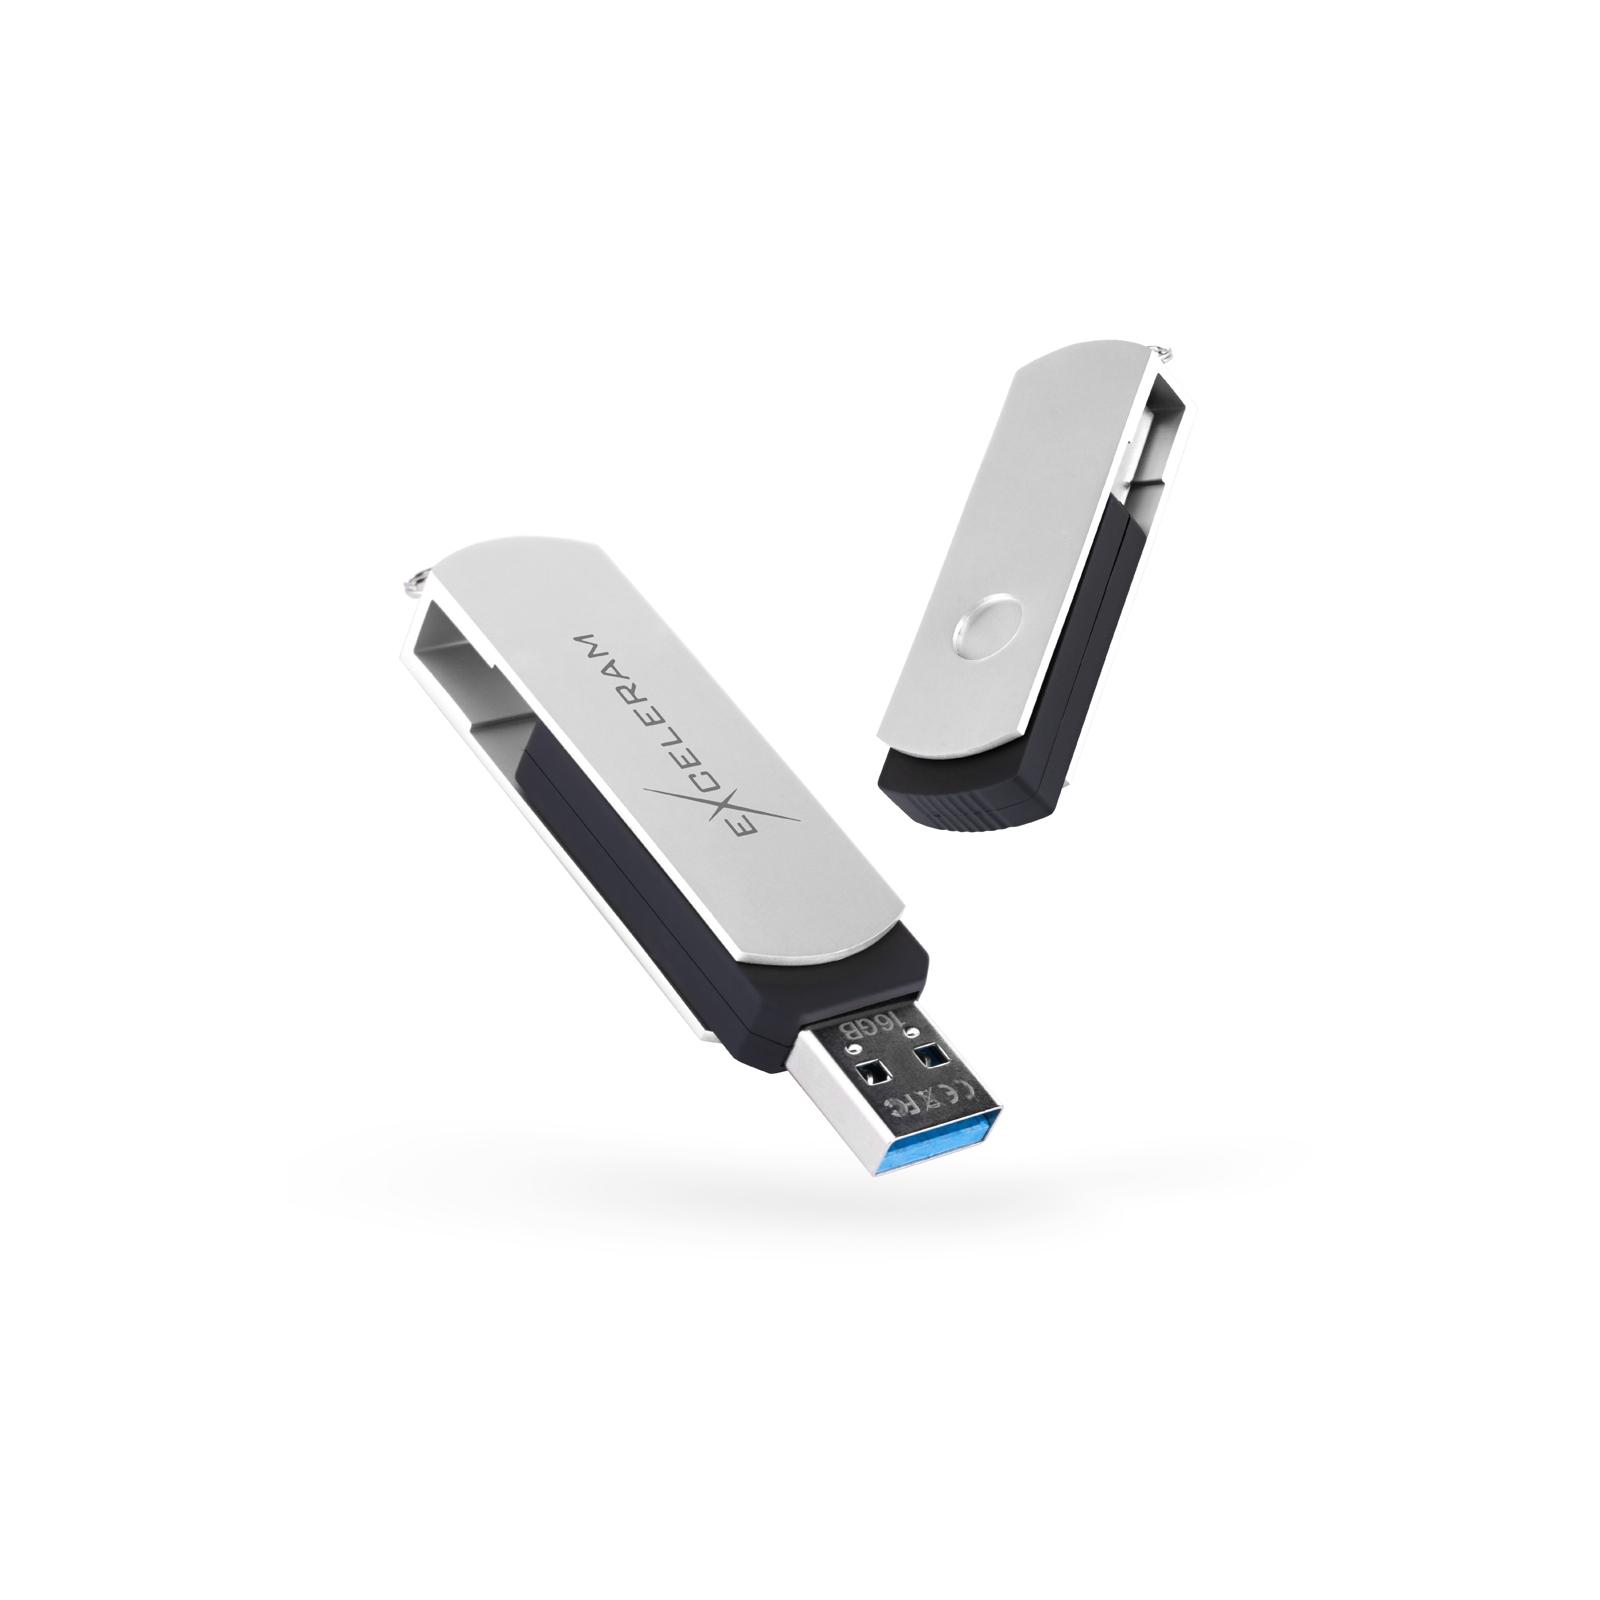 USB флеш накопитель eXceleram 64GB P2 Series Yellow2/Black USB 2.0 (EXP2U2Y2B64)